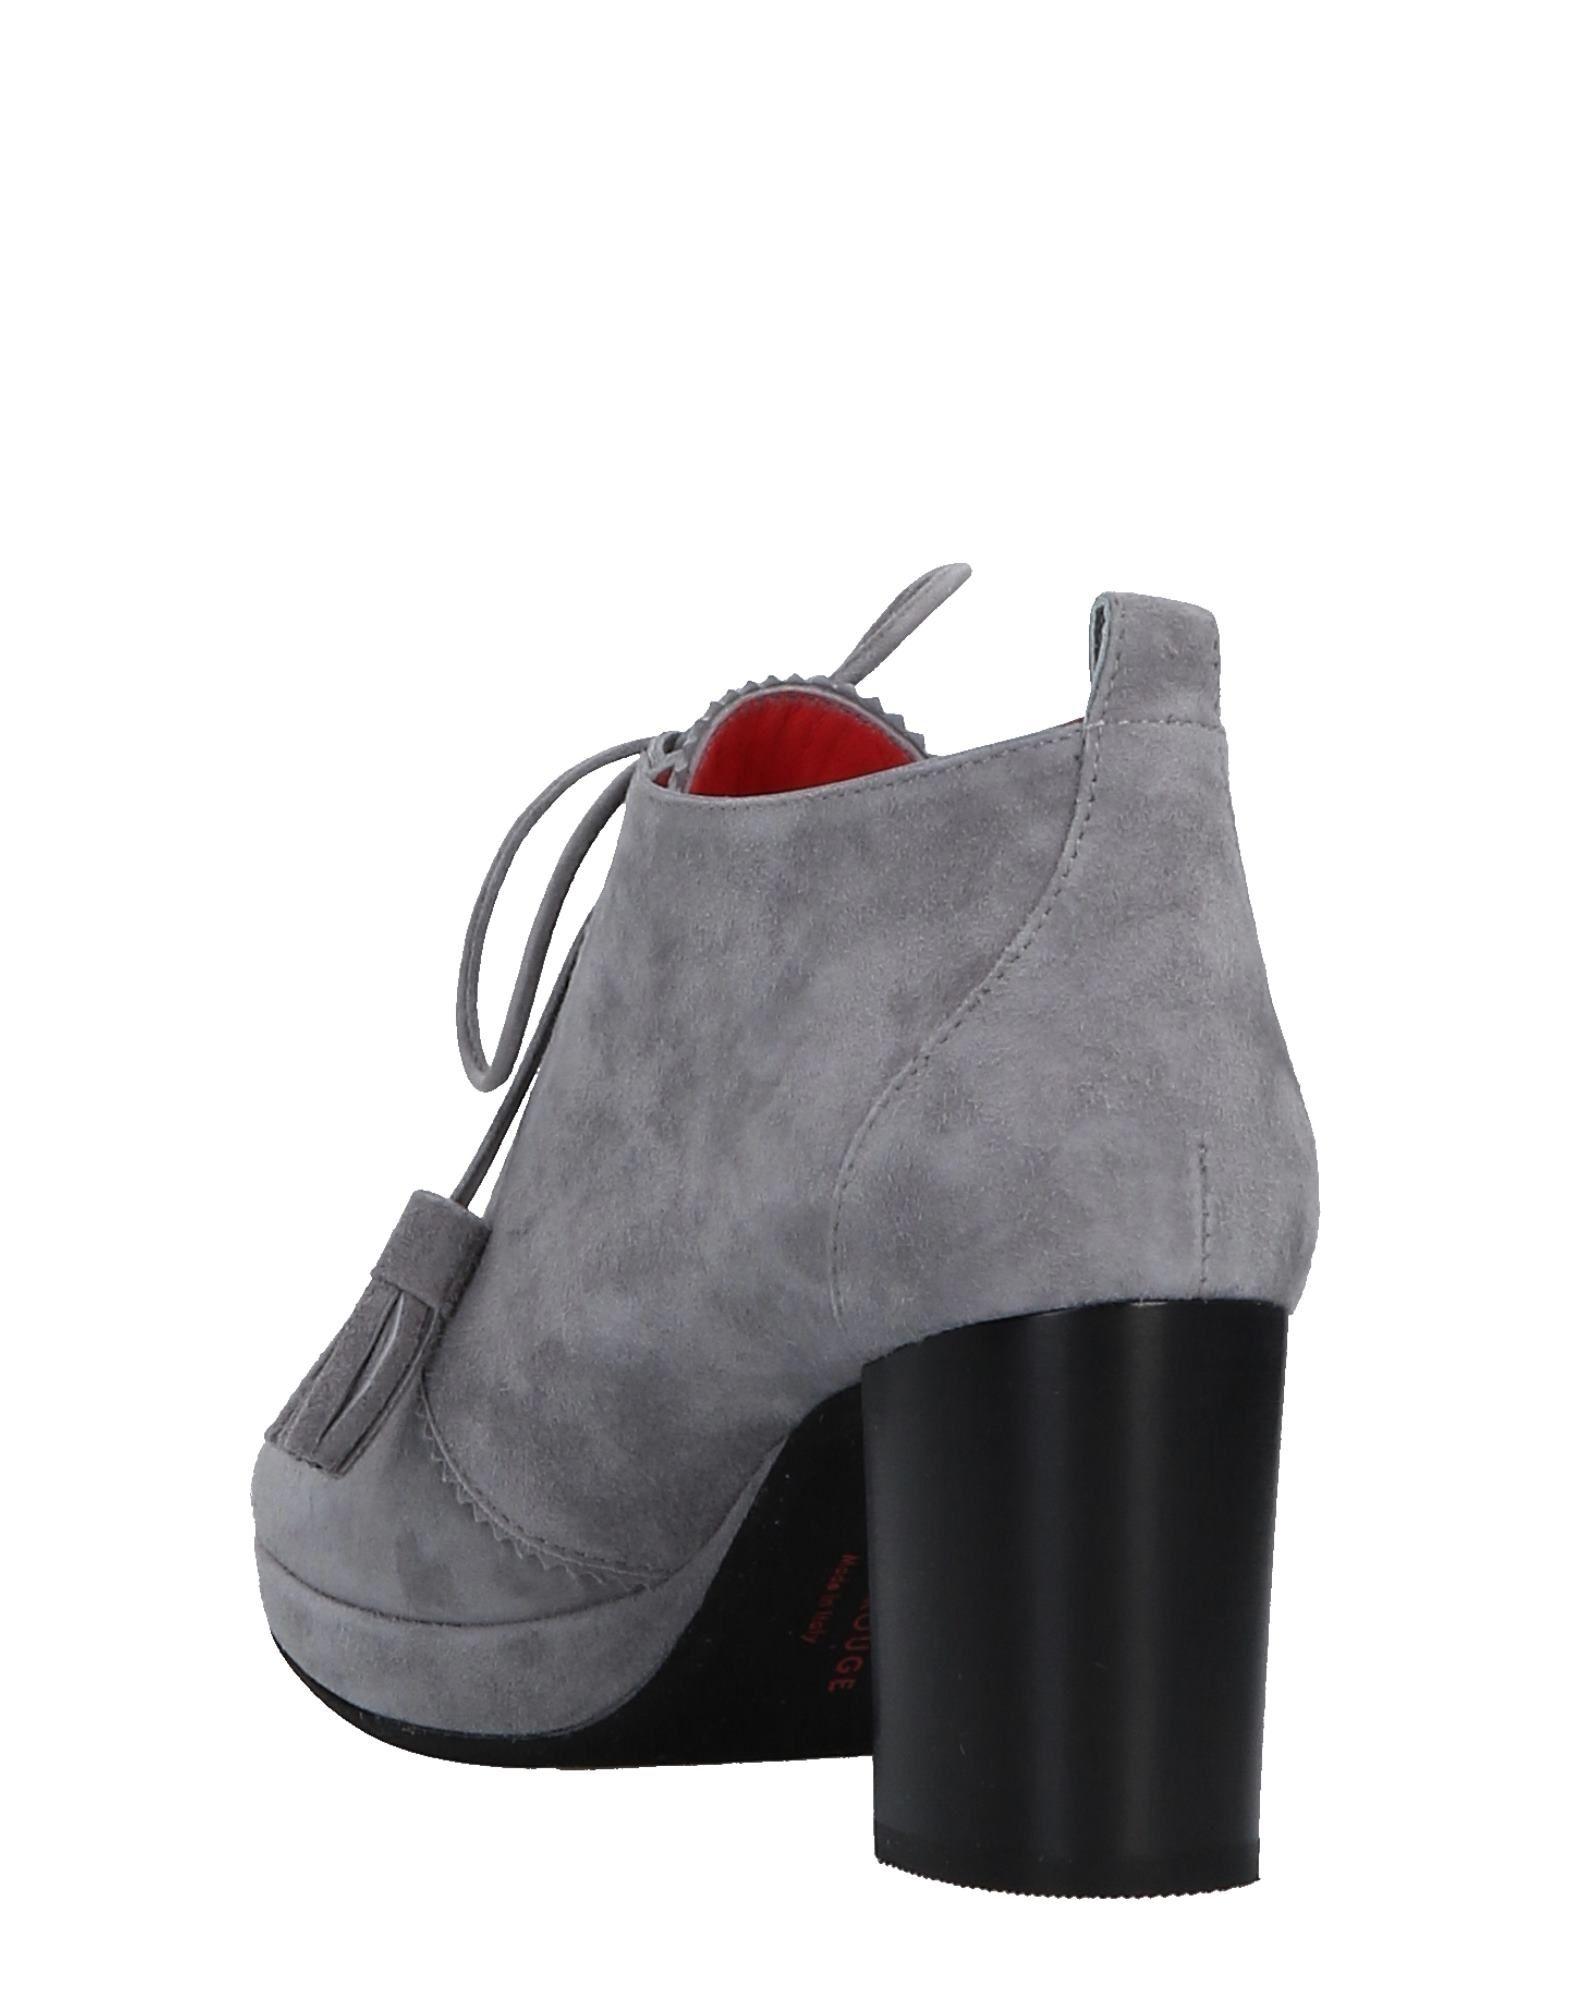 ... Pas De Rouge Stiefelette Damen Schuhe 11512856OEGut aussehende  strapazierfähige Schuhe Damen 9c0dce ... add76bcefa